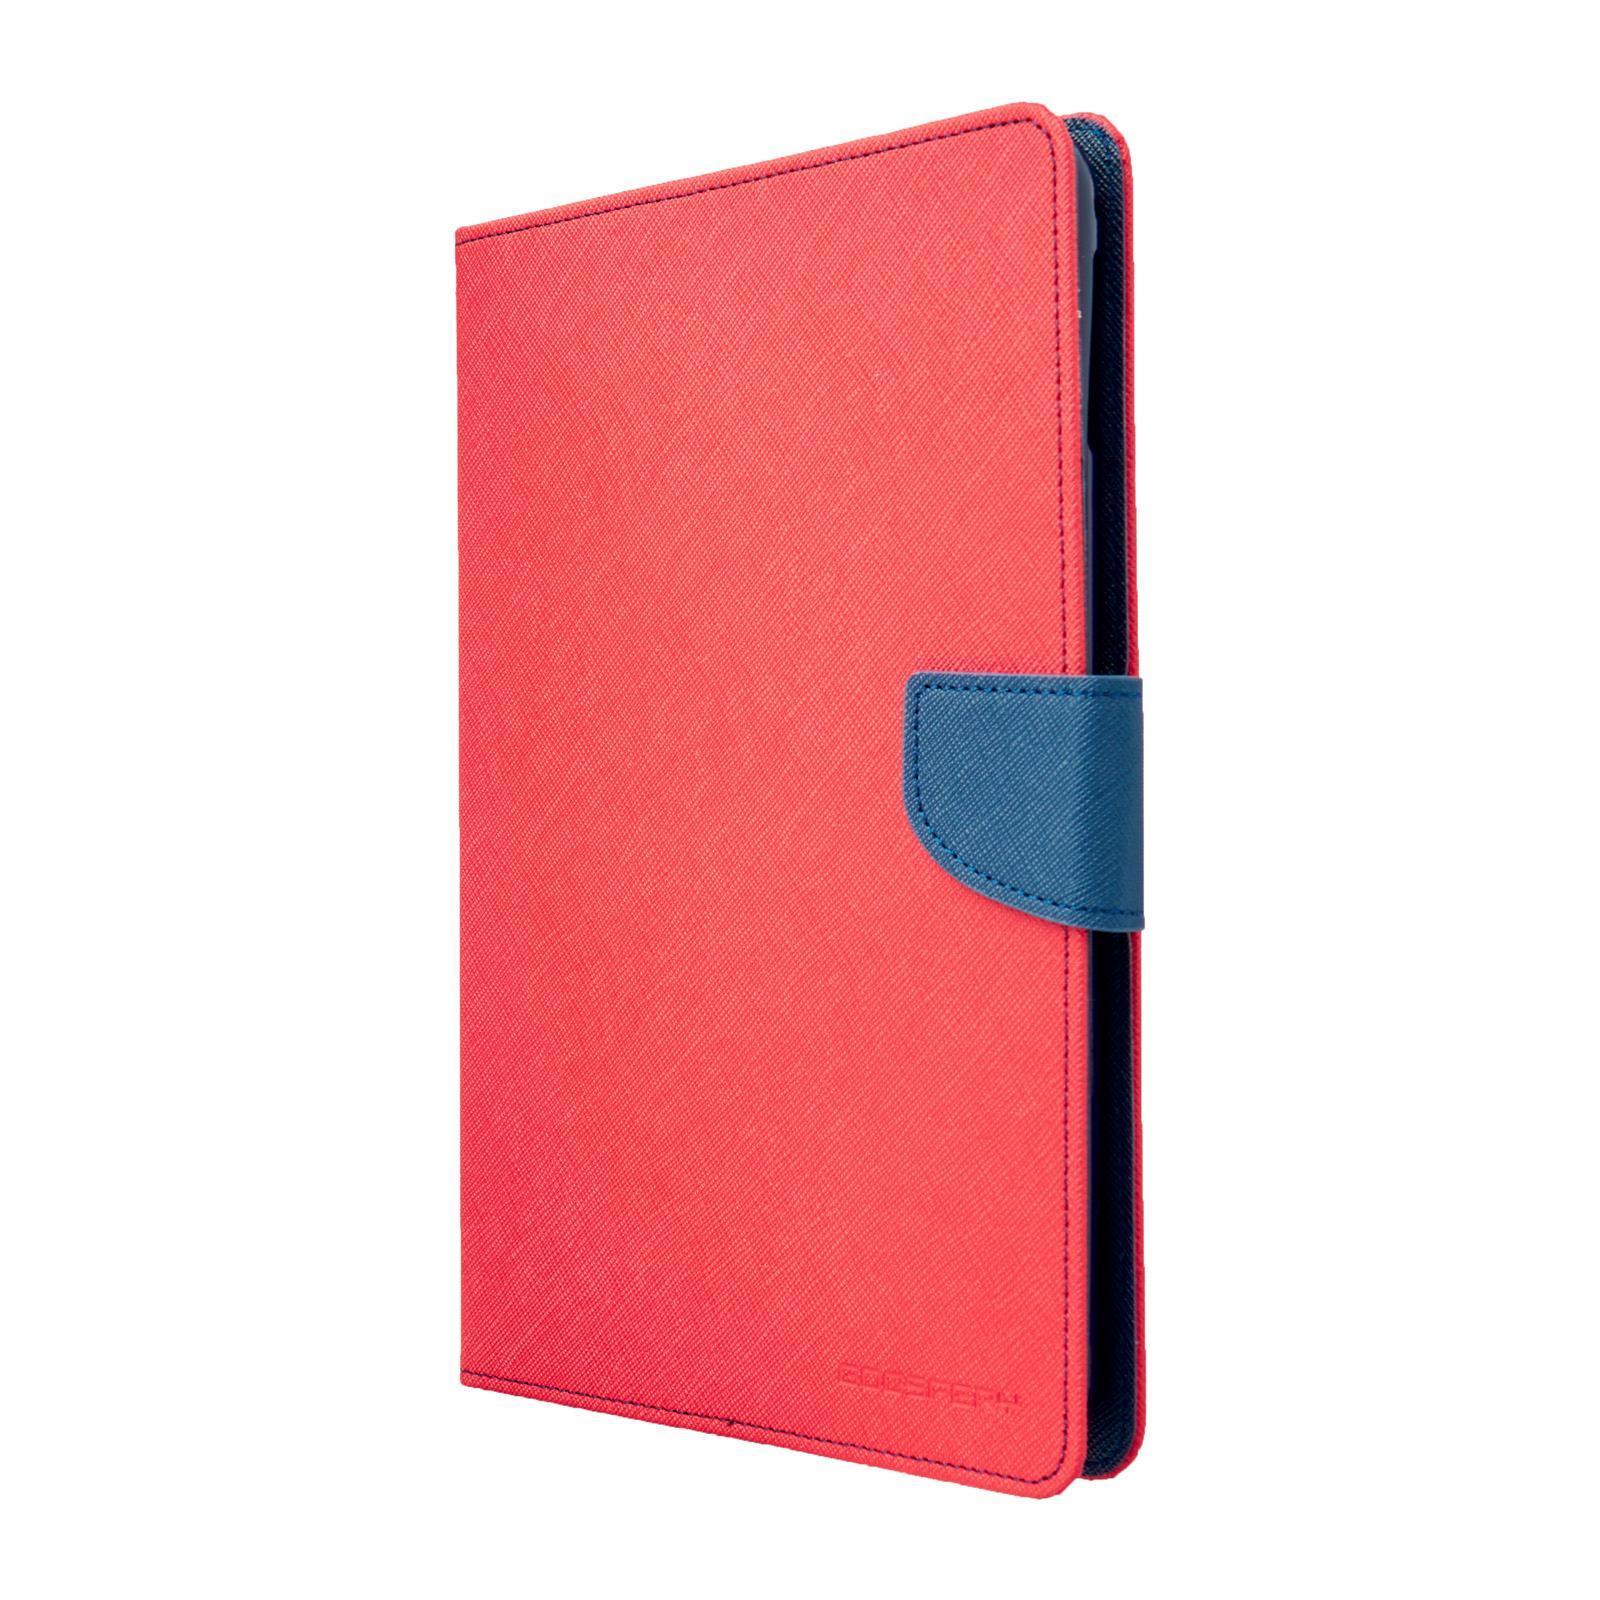 the best attitude 0e746 8d905 Mercury Goospery Ipad Mini 4 Goospery Fancy Diary Case - Red/Navy